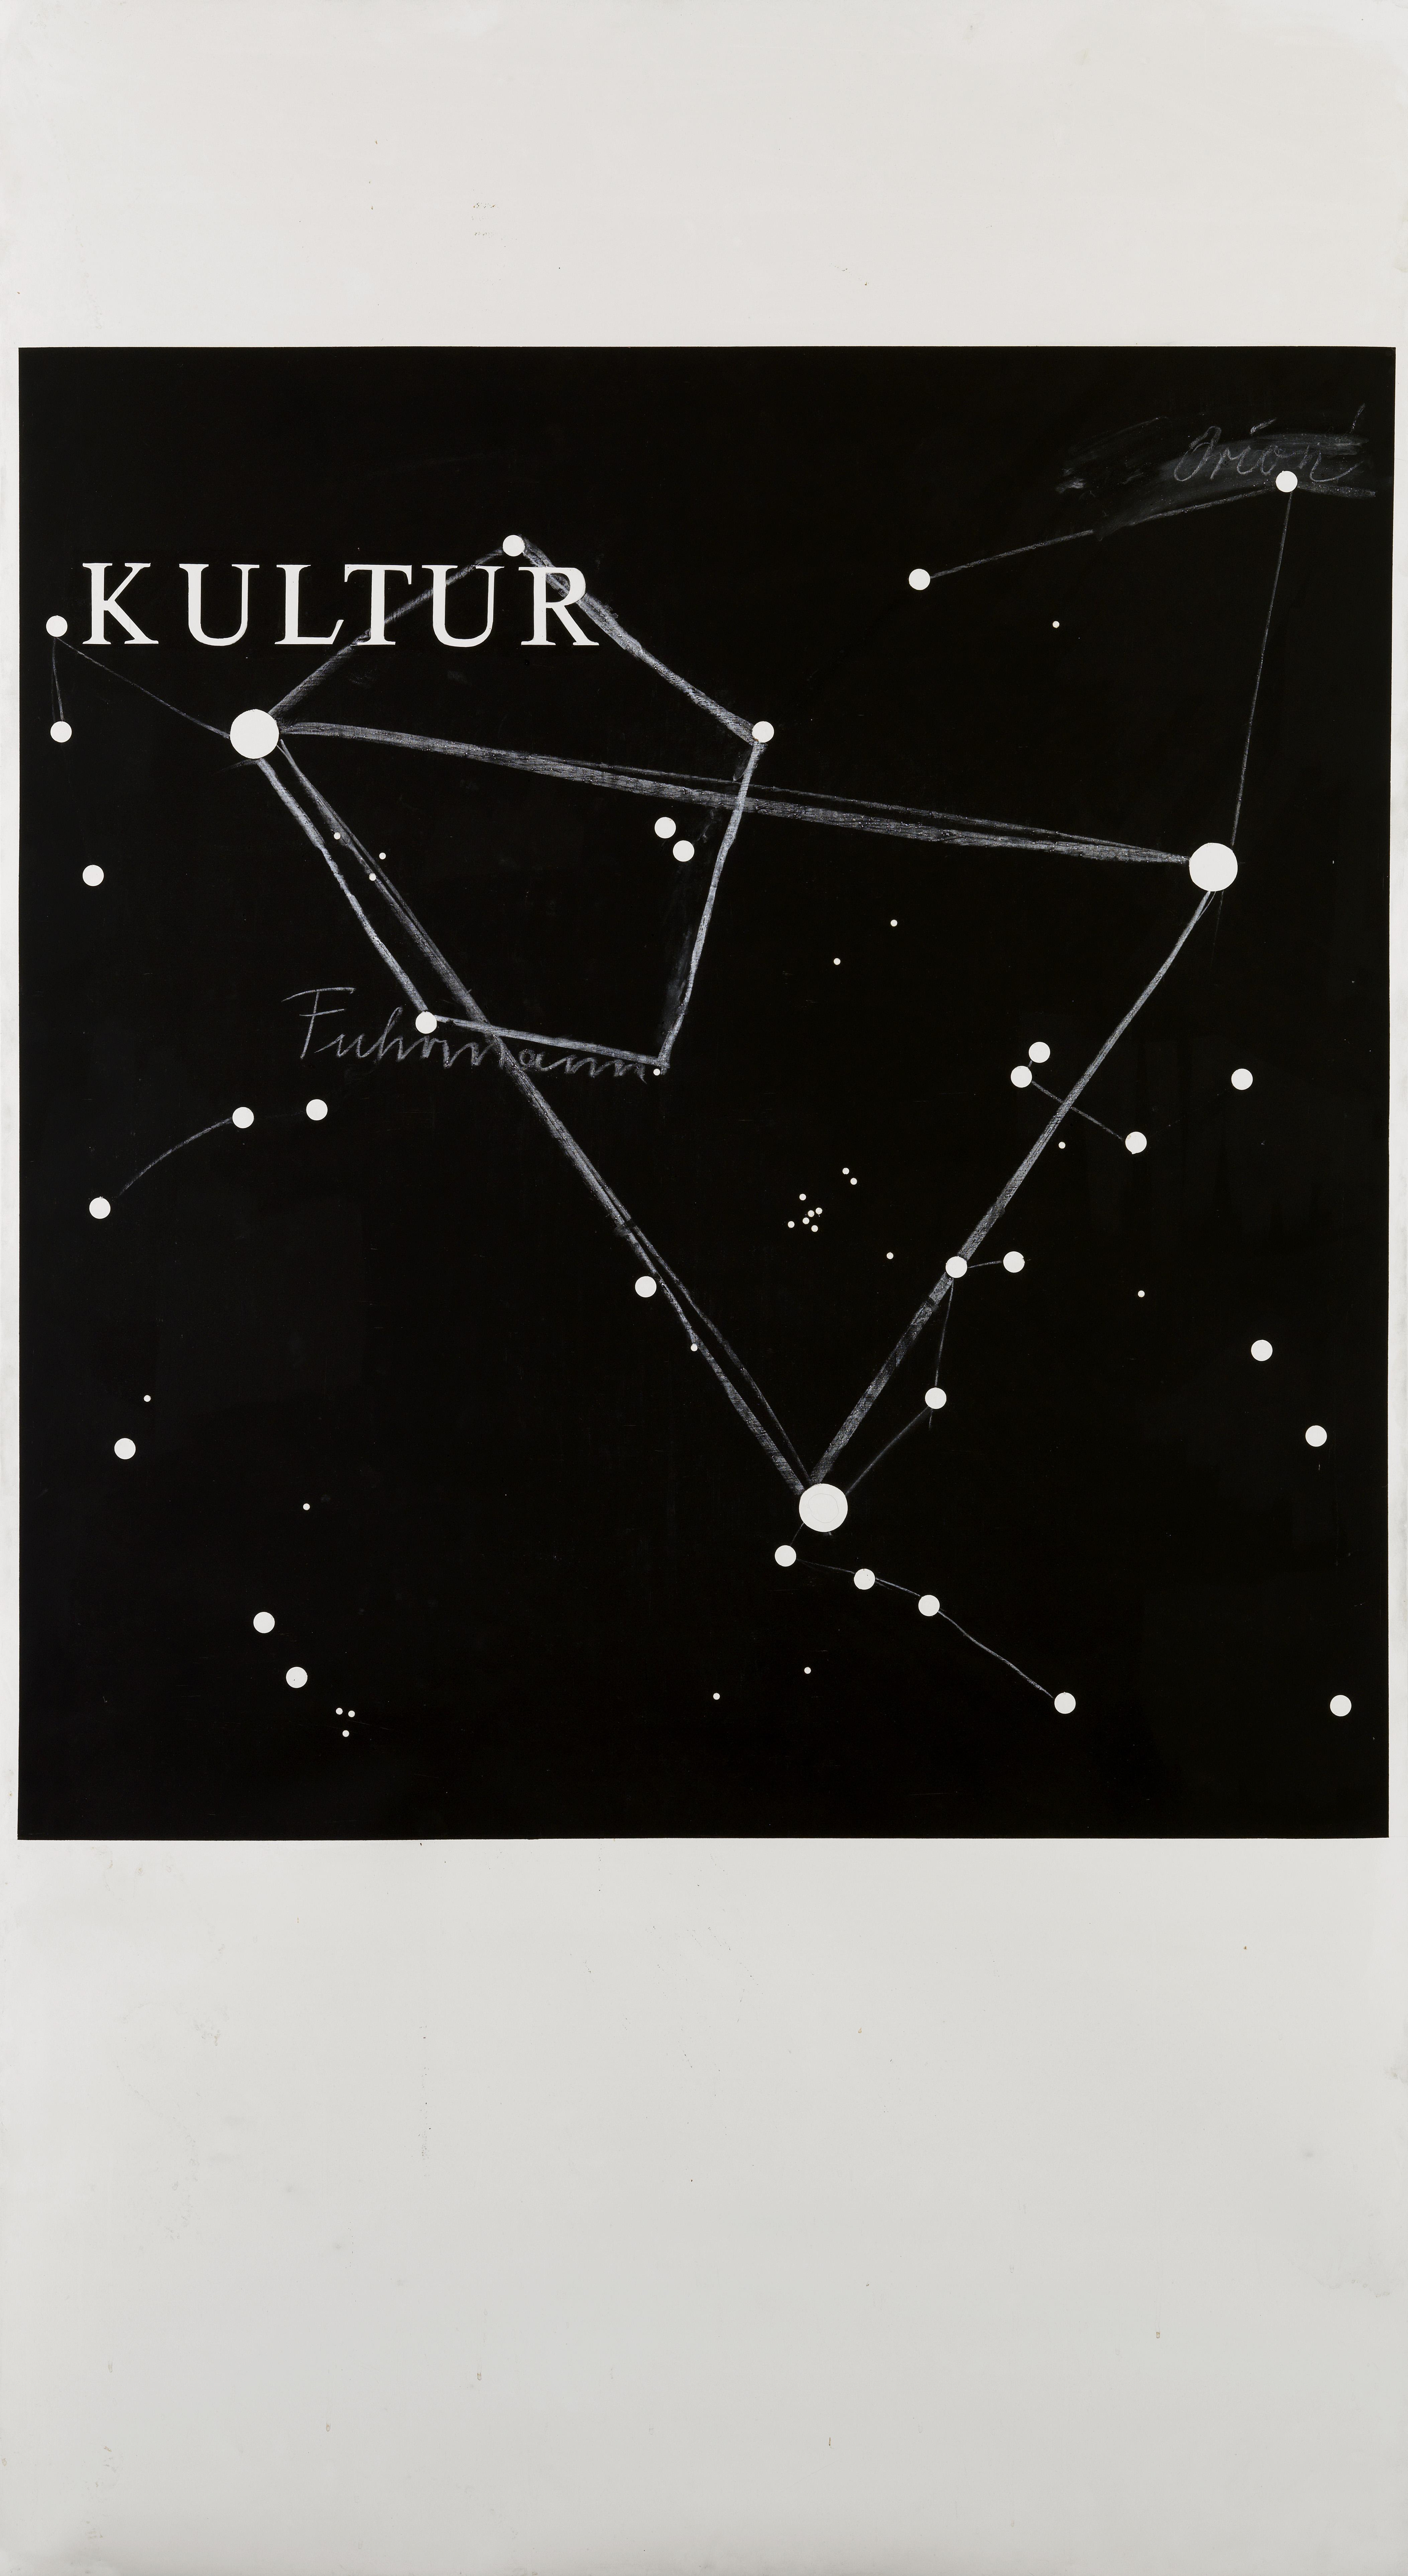 KP Brehmer, Kultur, 1974, Paint, chalk on melamine 220 x 120 cm / 86 5/8 x 47 1/4 ins. KP Brehmer